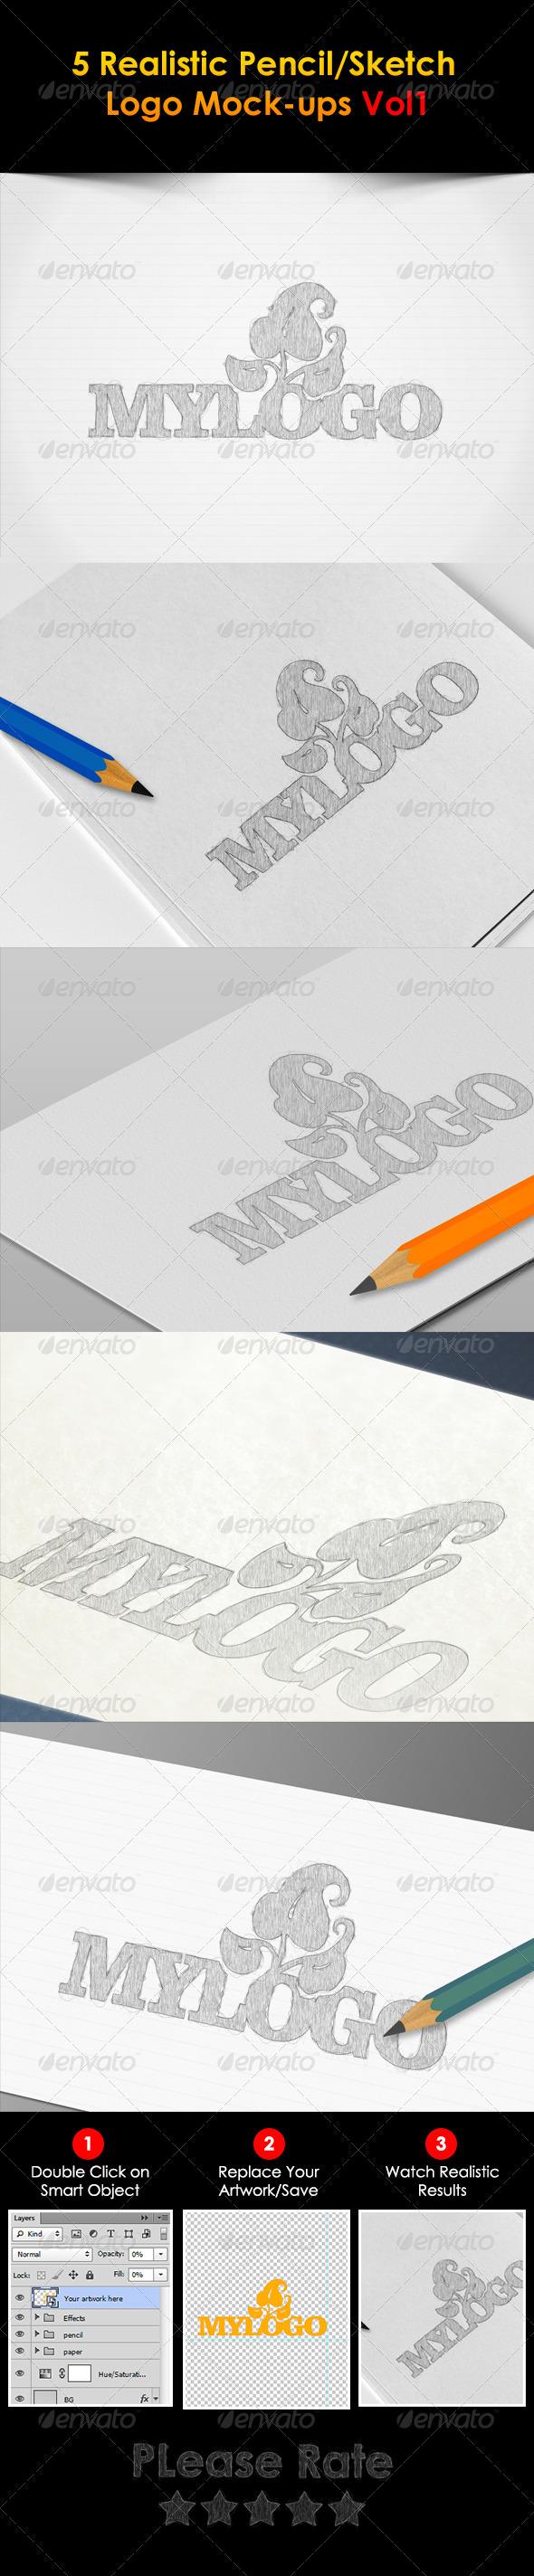 5 Sketch Logo Mock-ups - Logo Product Mock-Ups